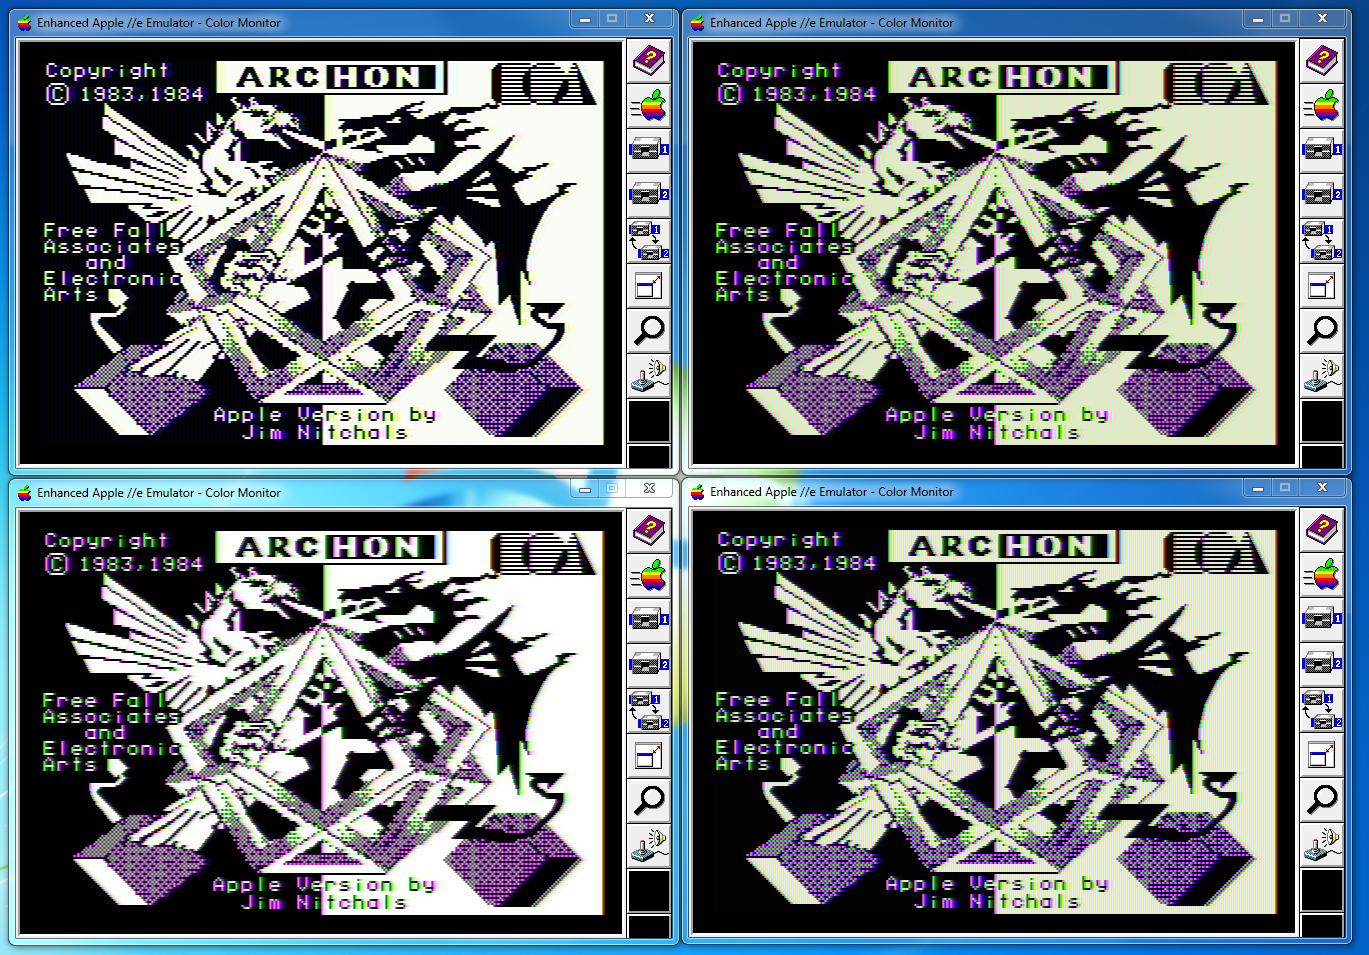 4ntsc_archon_orgtl_sharptr_softbl_smoothbr